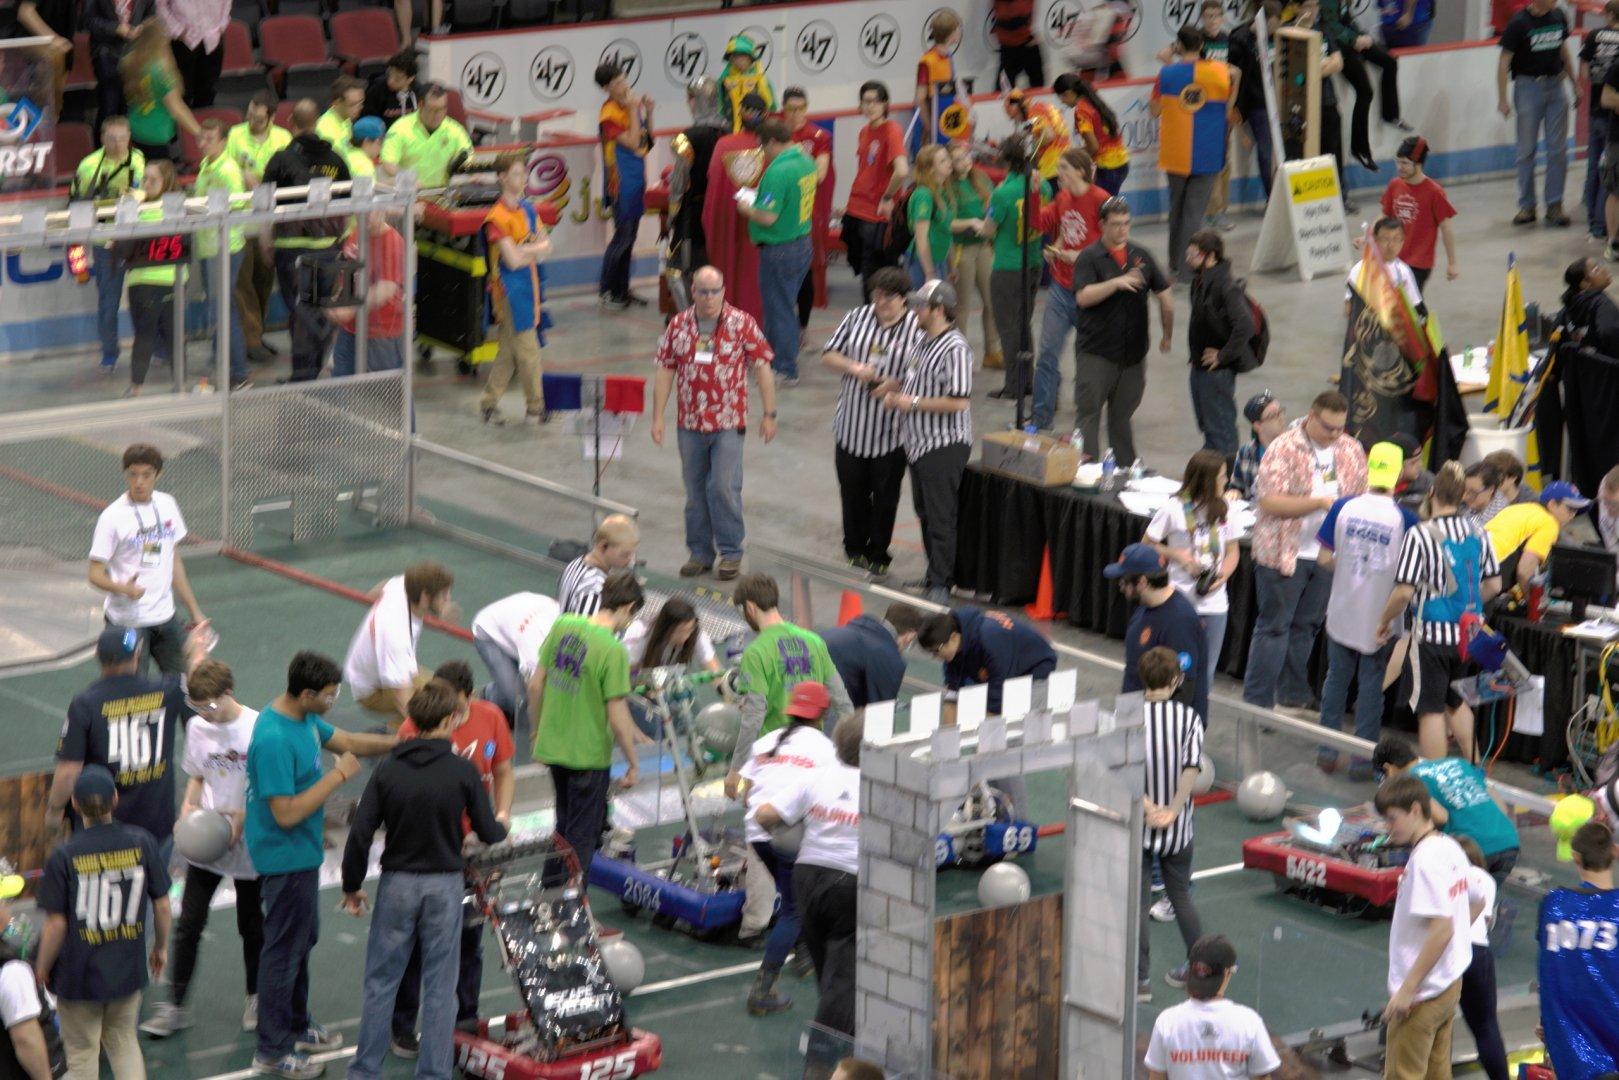 177.Boston FIRST Robotics Competition 04-03-2016.jpg